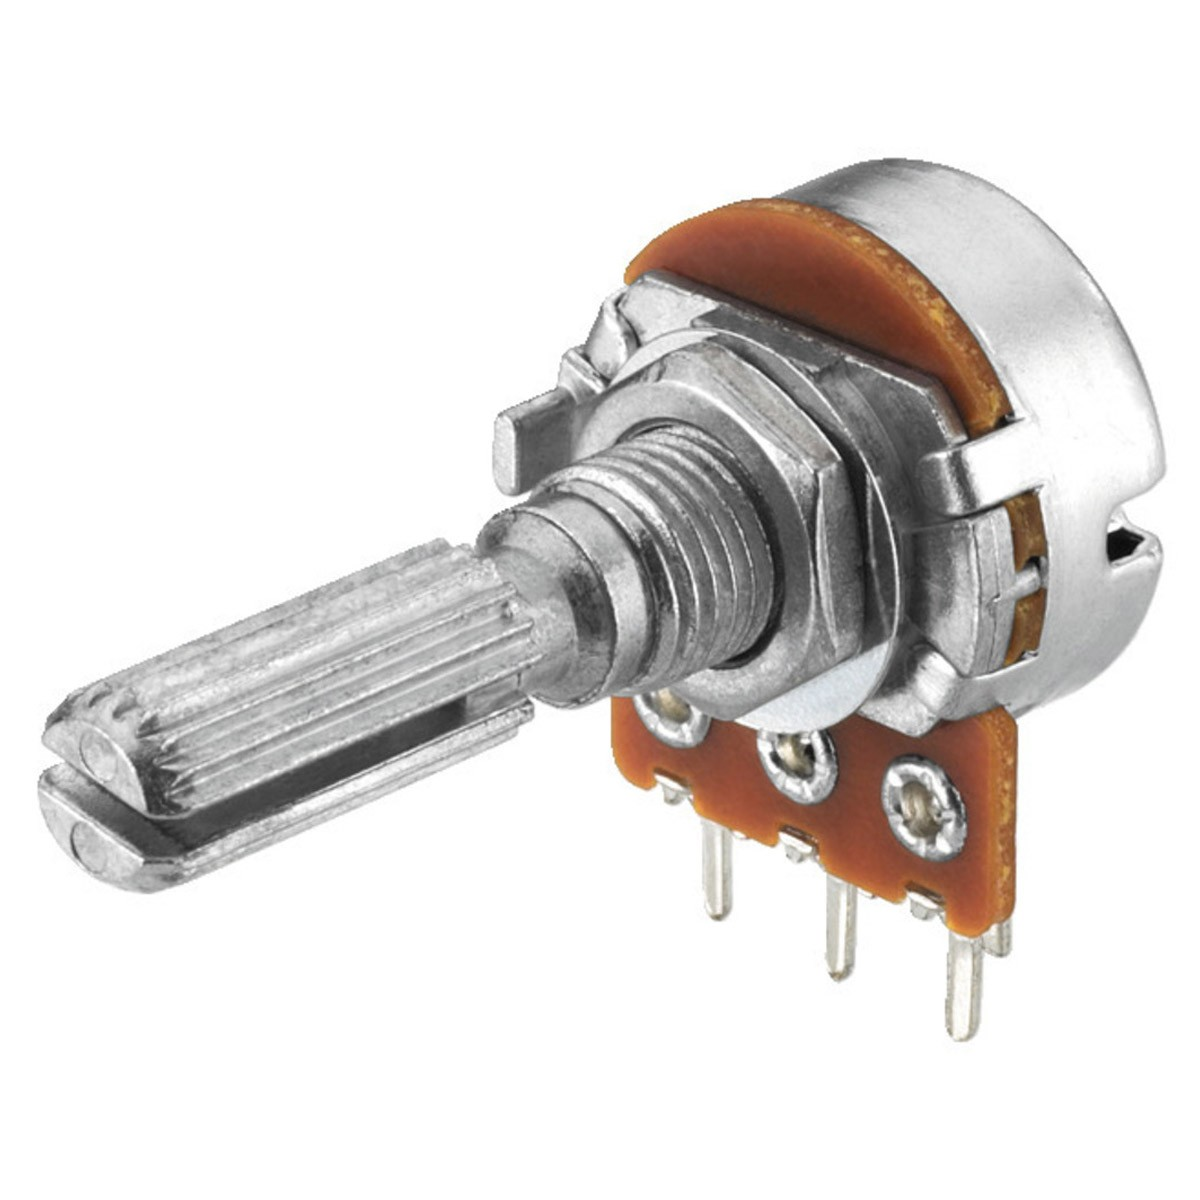 VRB-100M1000 Potentiomètre Mono 1M Ohm